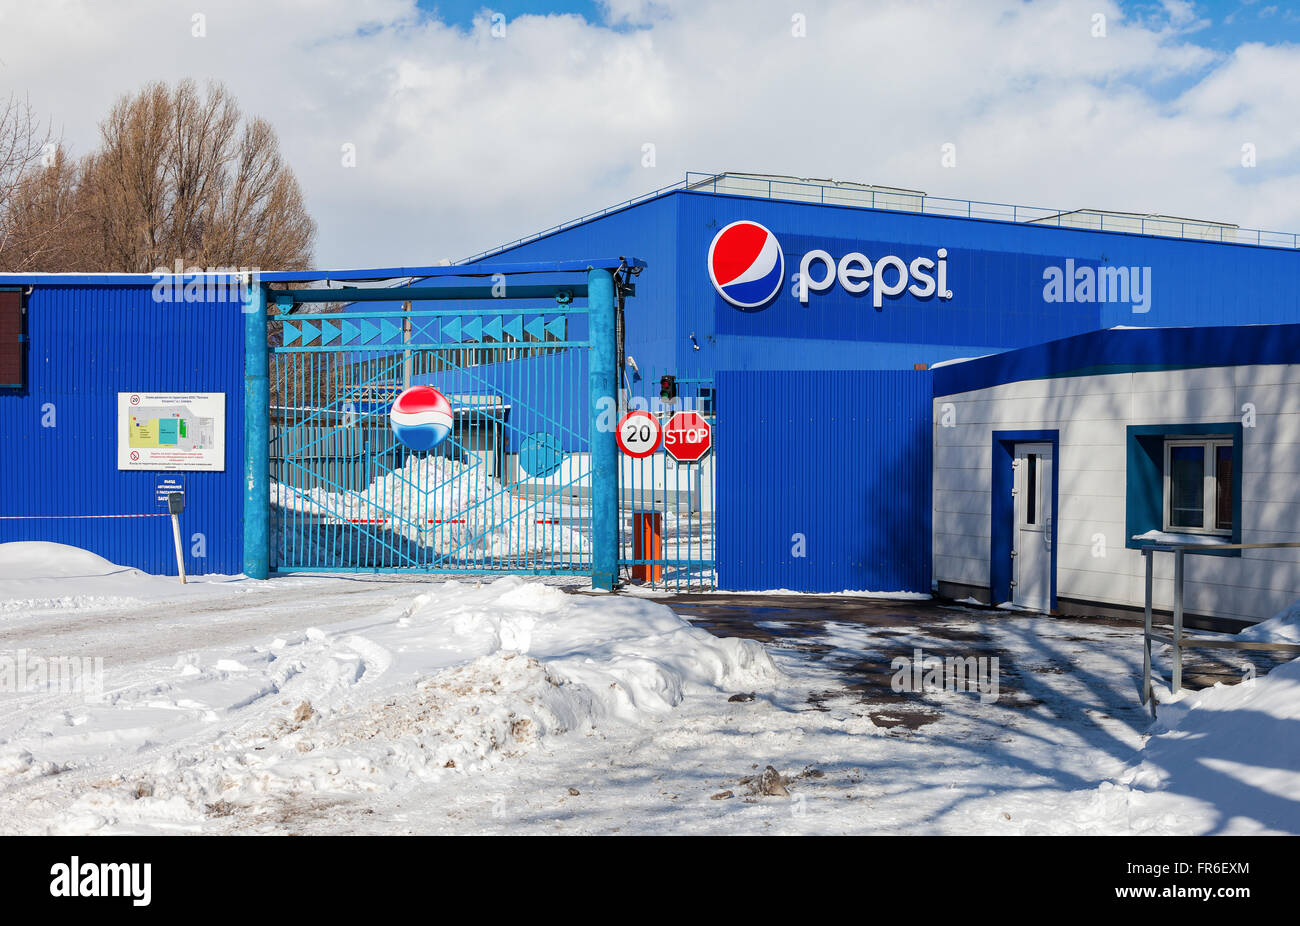 Factory of Pepsi Corporation in Samara, Russia - Stock Image